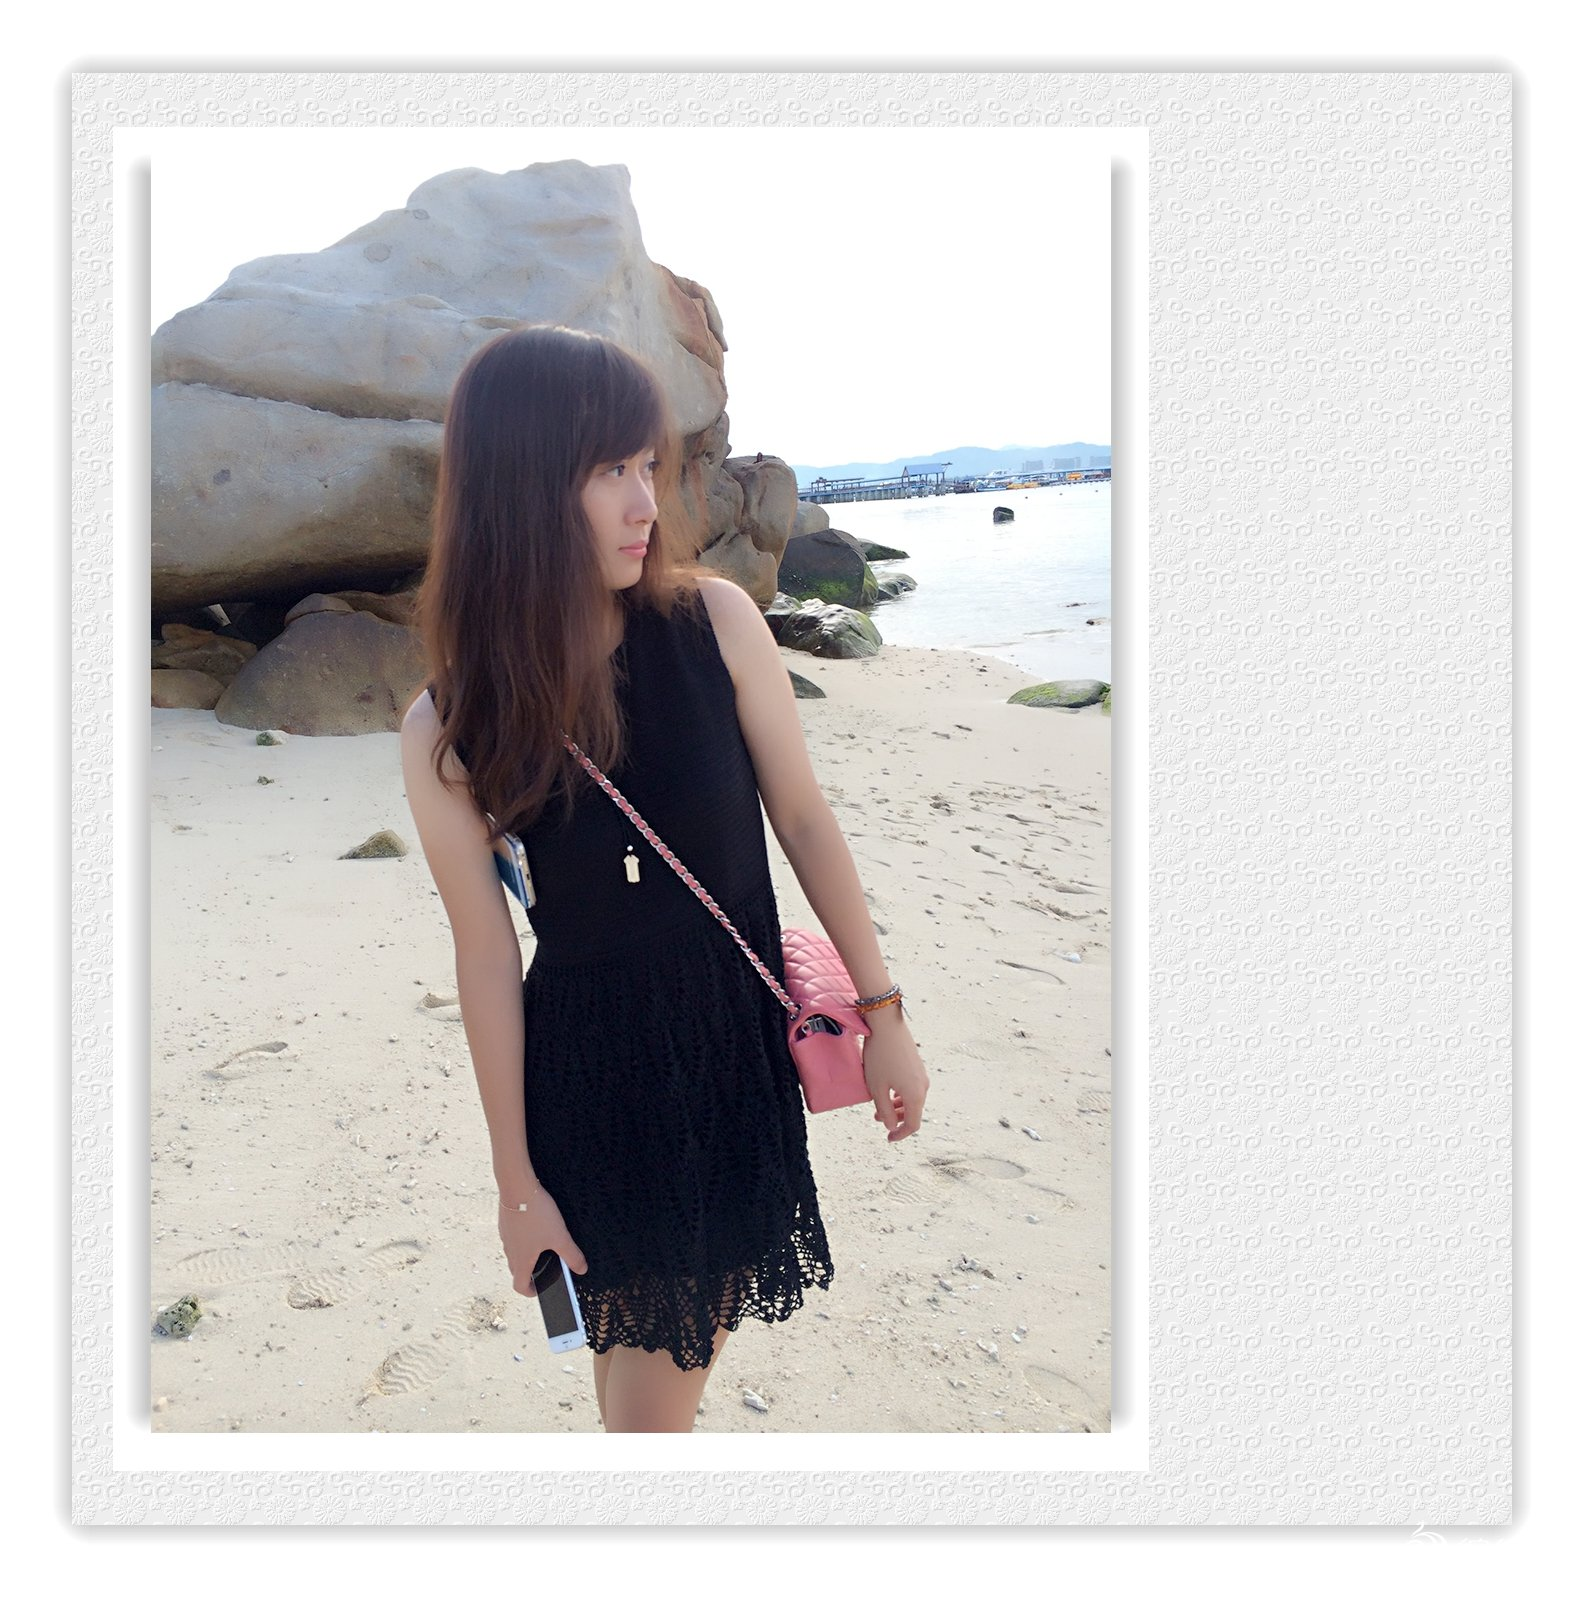 PIC_20150803_180642_013.jpg